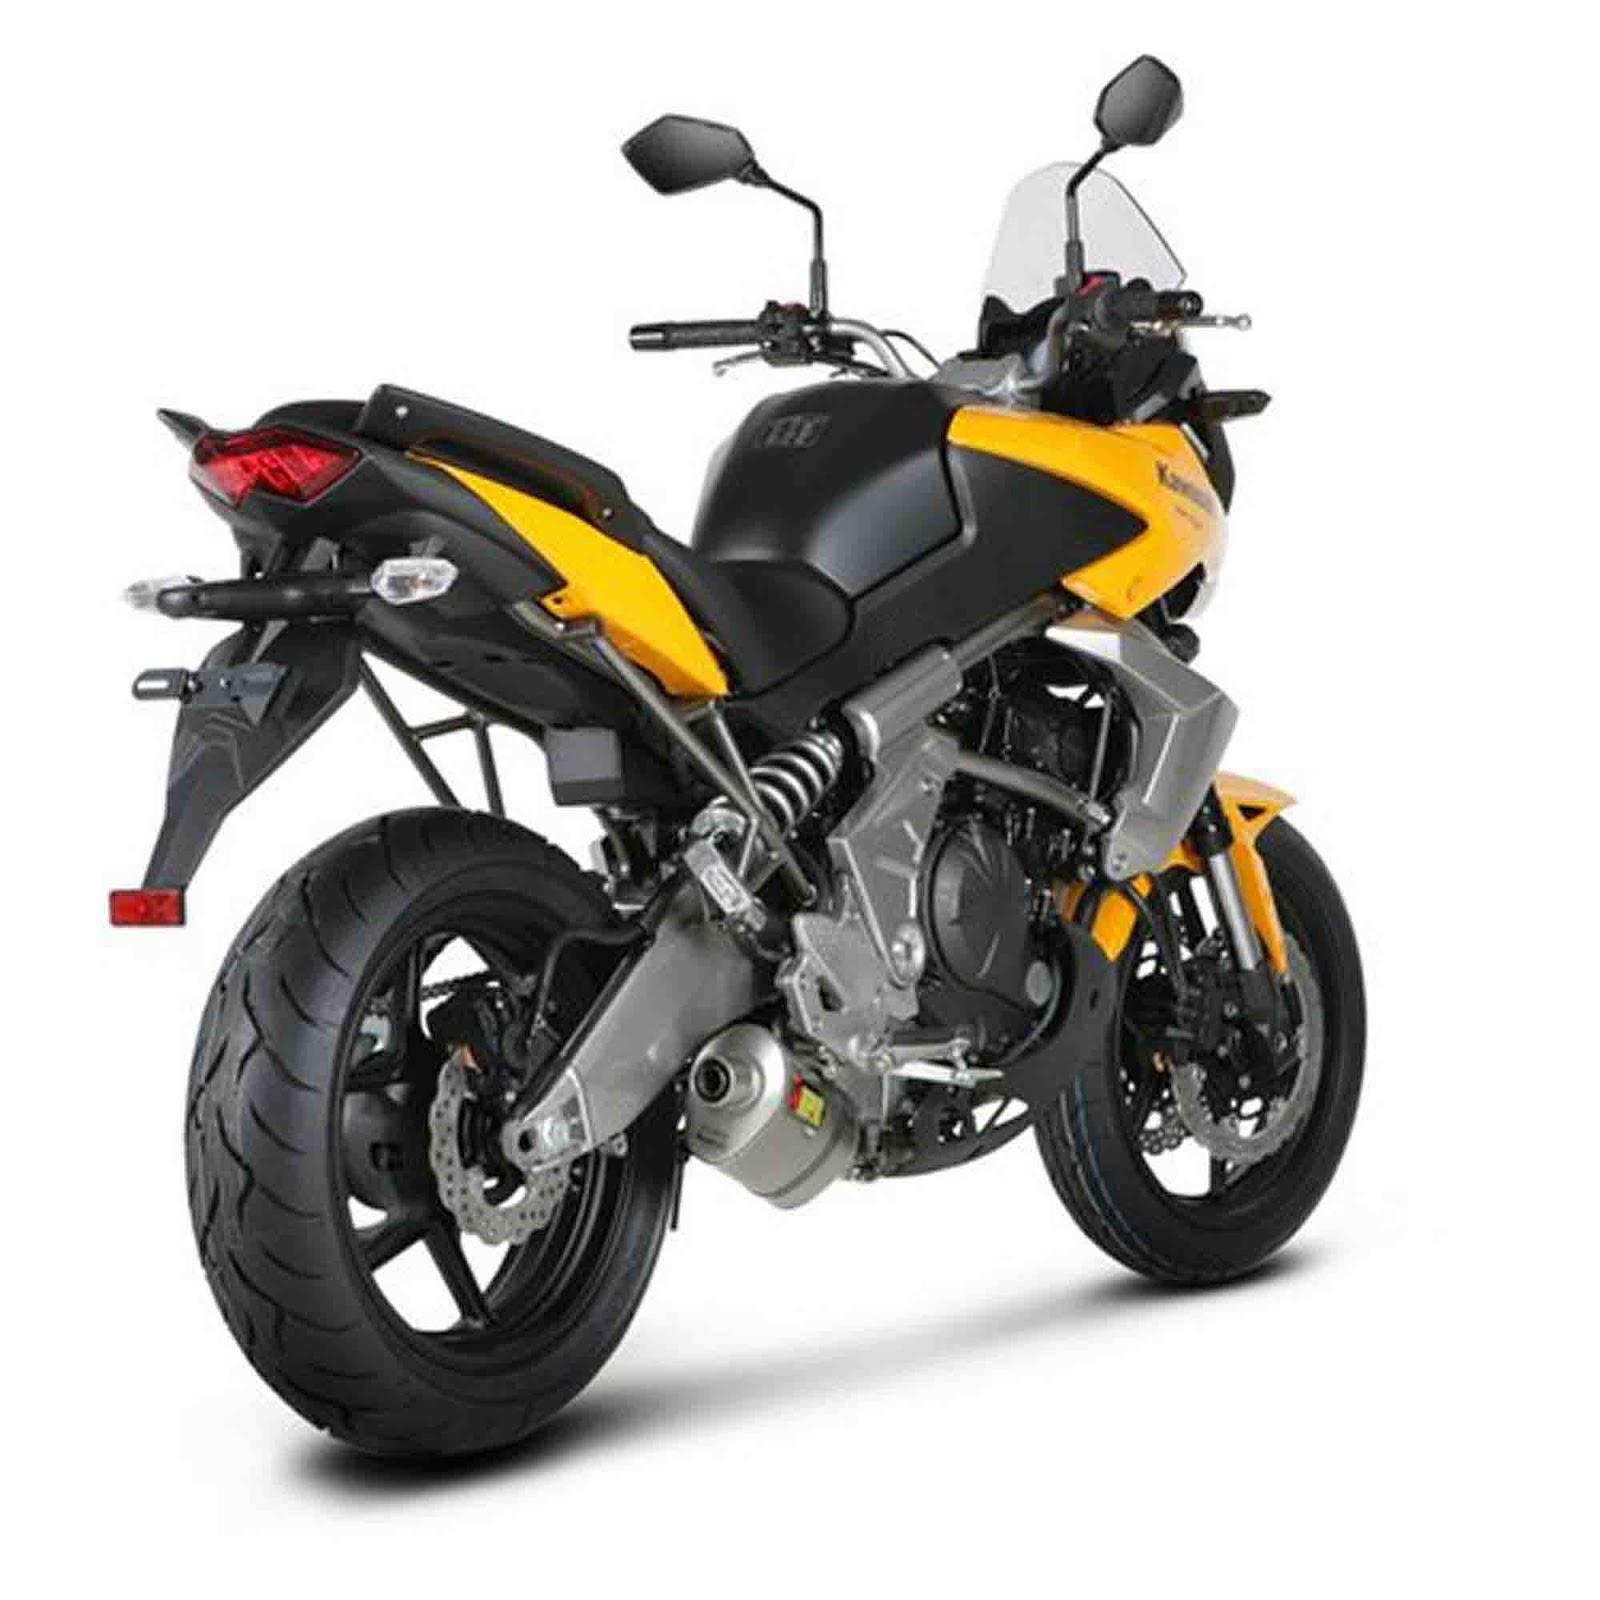 kawasaki motor bikes 2013 kawasaki versys 650. Black Bedroom Furniture Sets. Home Design Ideas